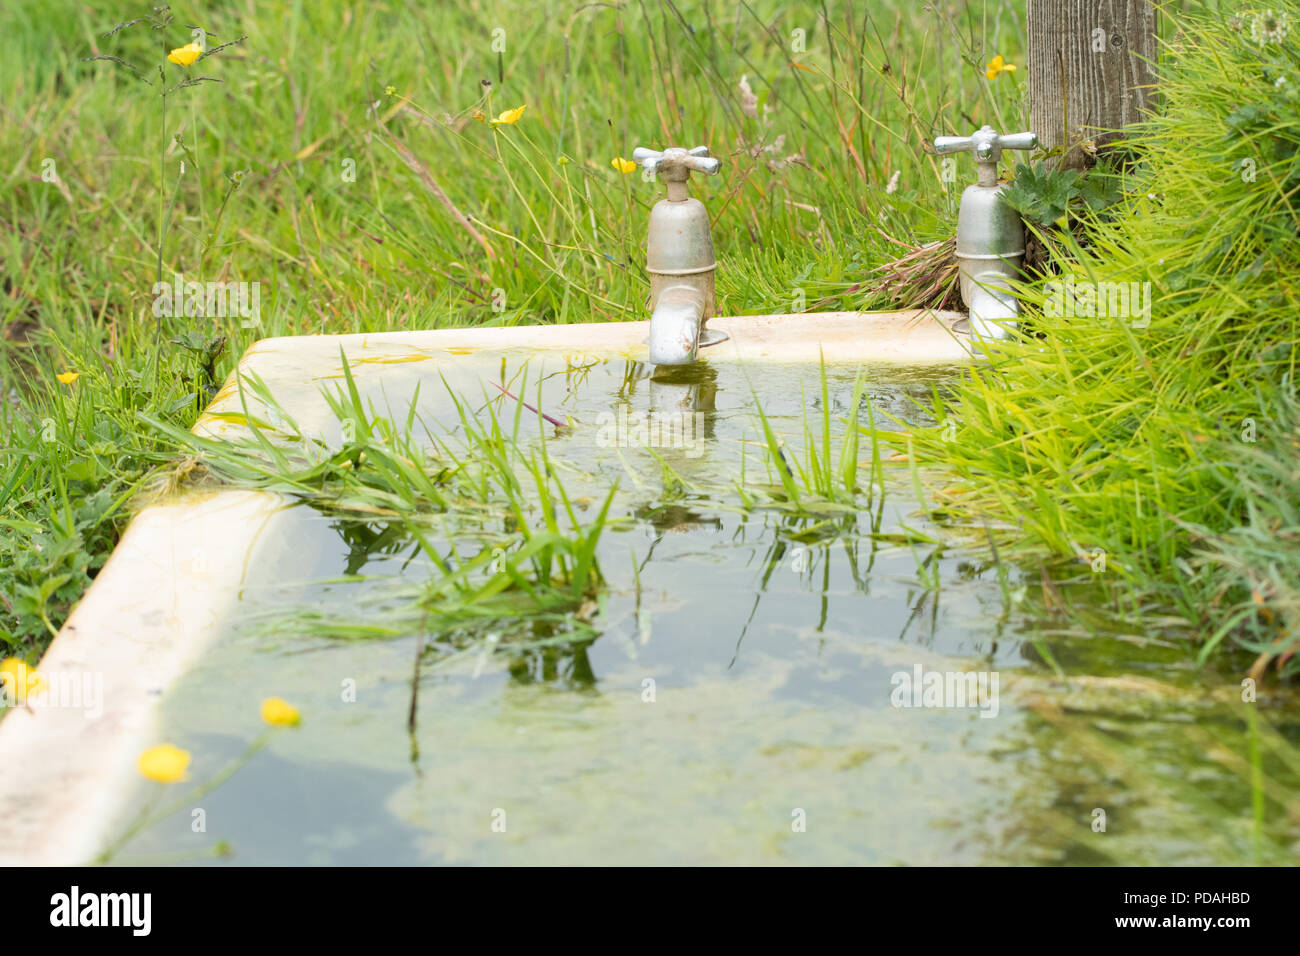 Baño fuera utilizado como un ganado comedero de agua - Escocia, Reino Unido Imagen De Stock